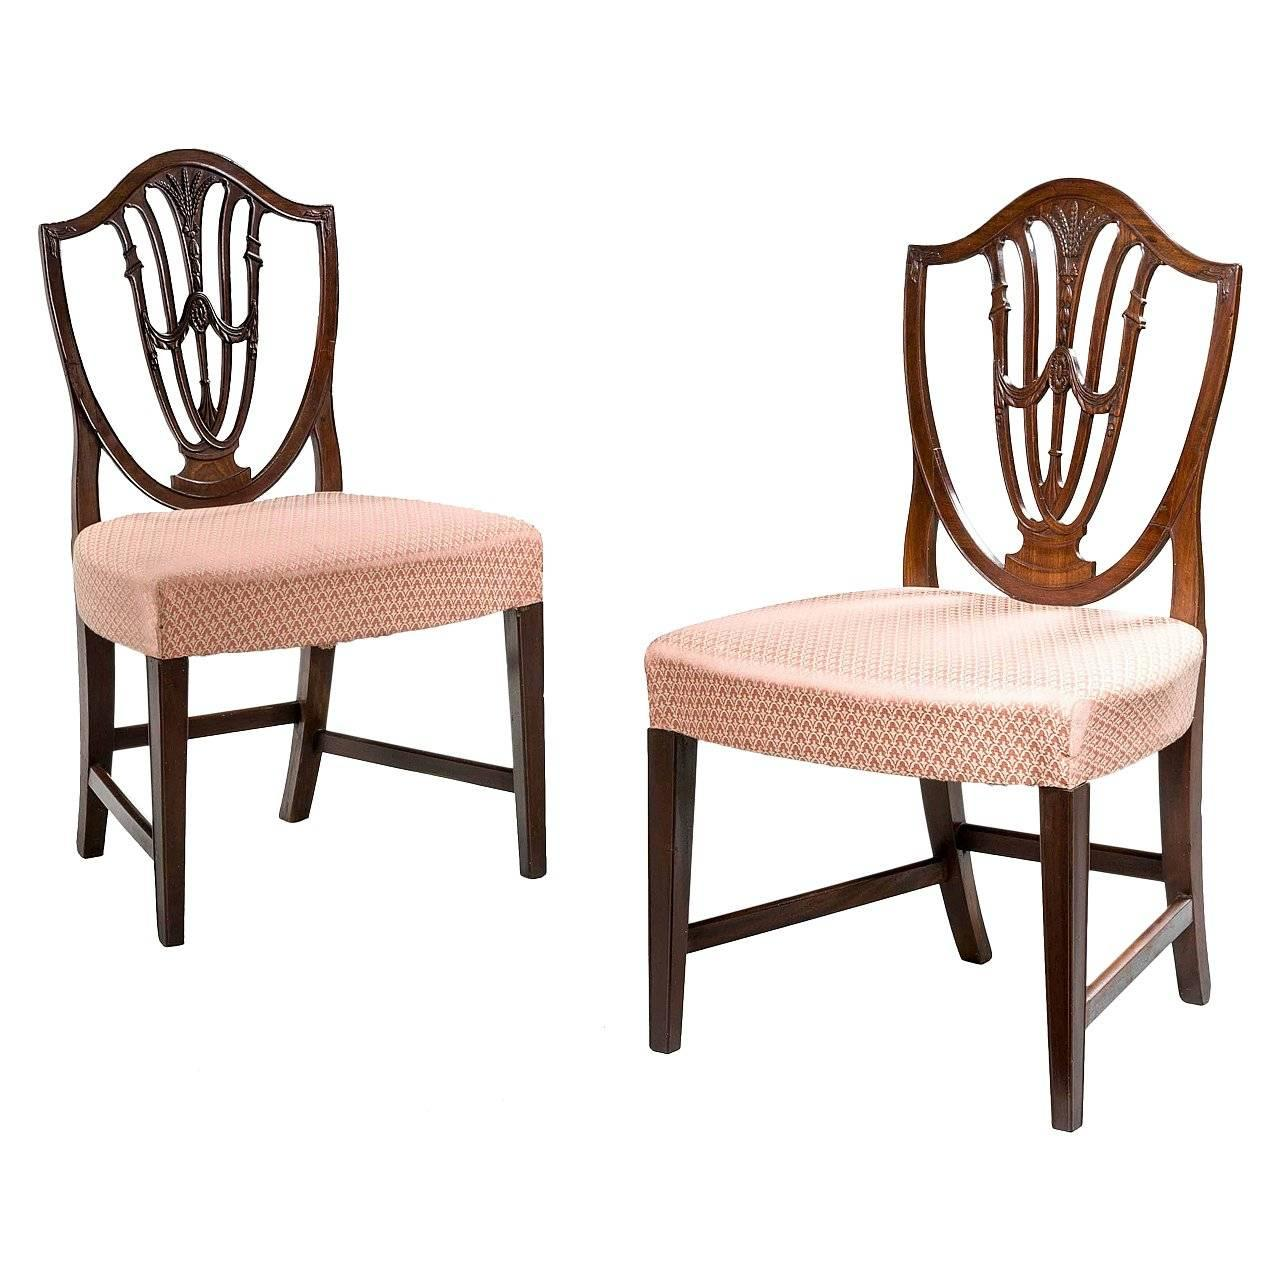 Charmant Pair Of George III Hepplewhite Chairs For Sale